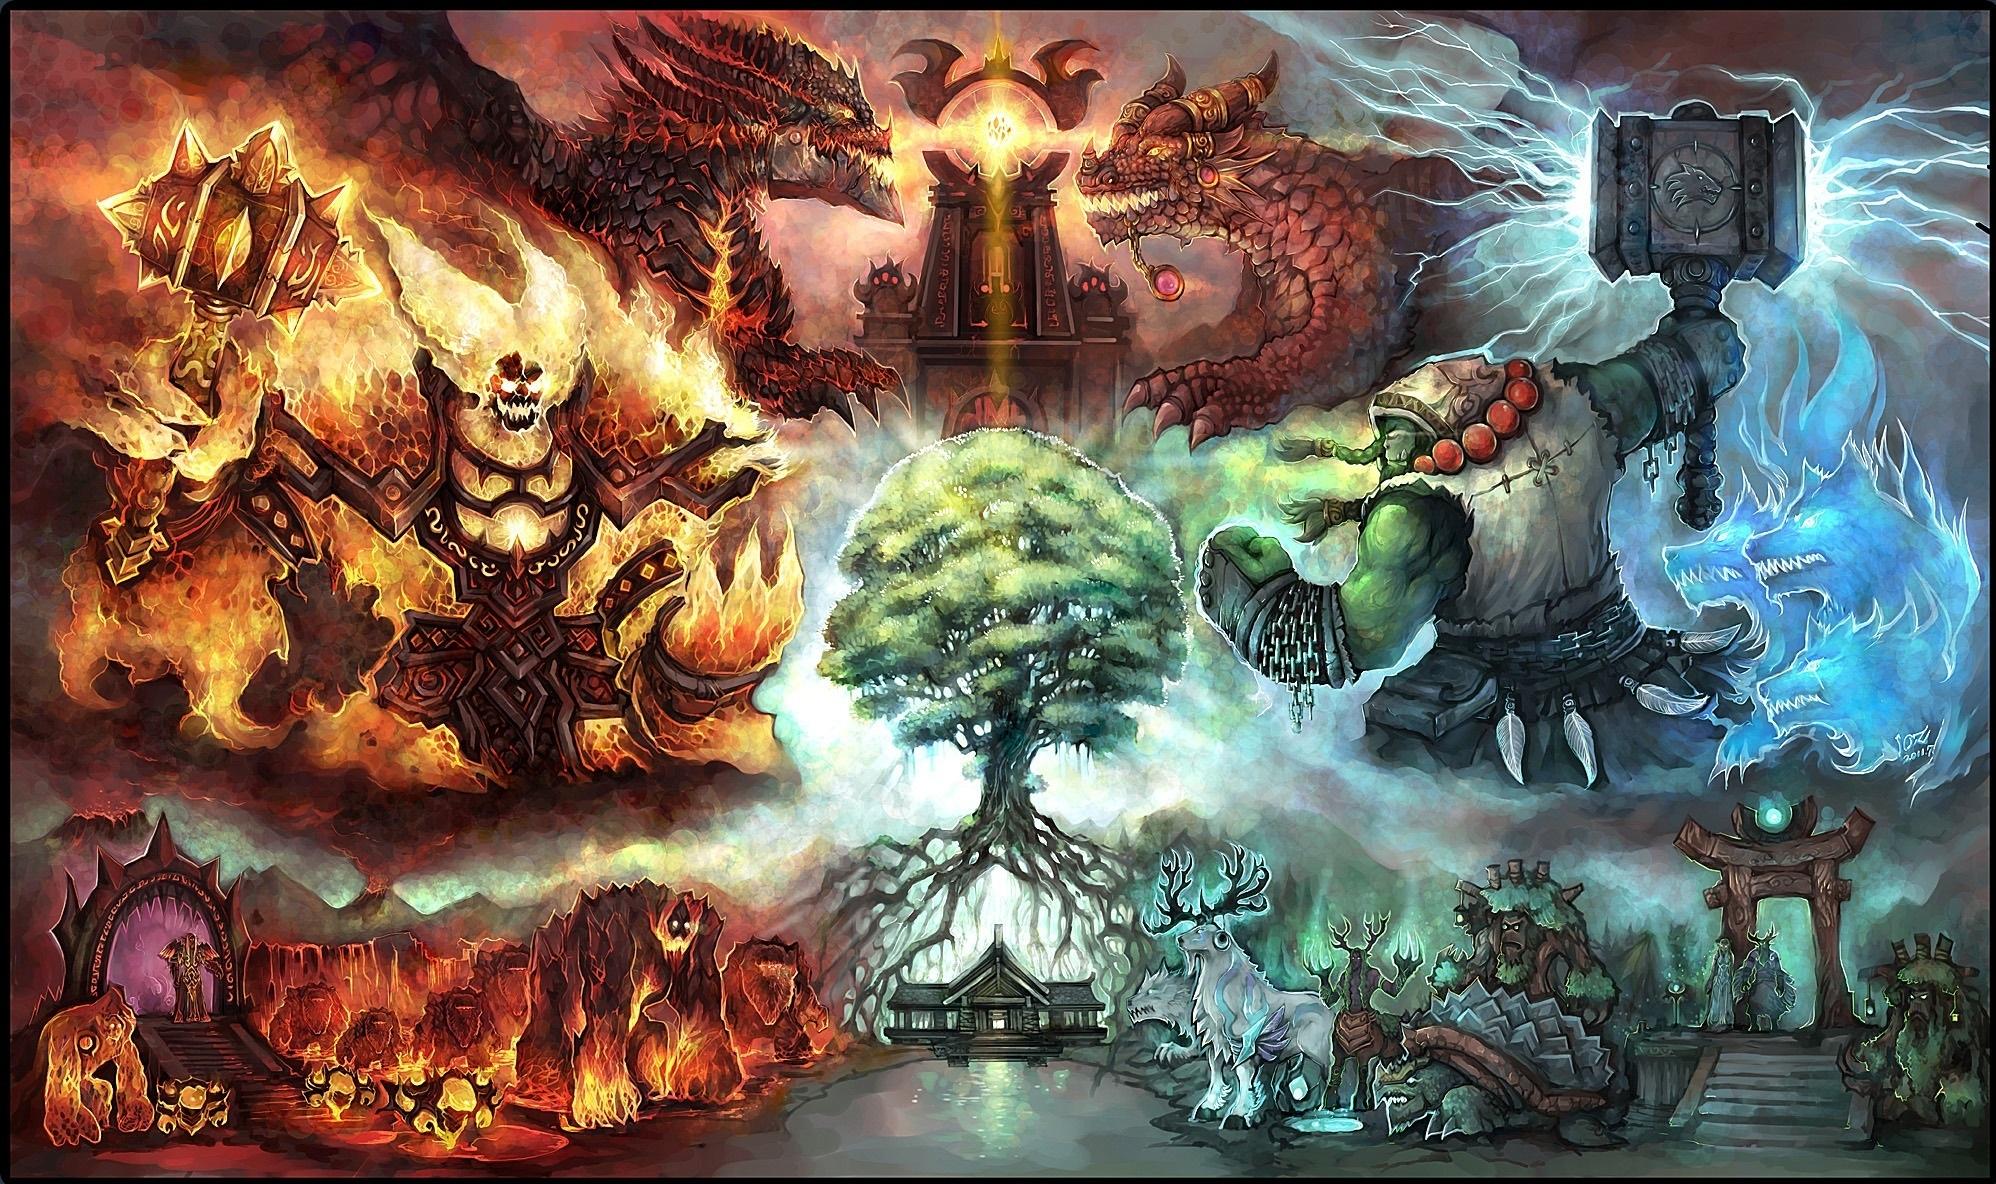 of WarCraft WoW Monster Dragon Warrior Games Fantasy wallpaper 1996x1184